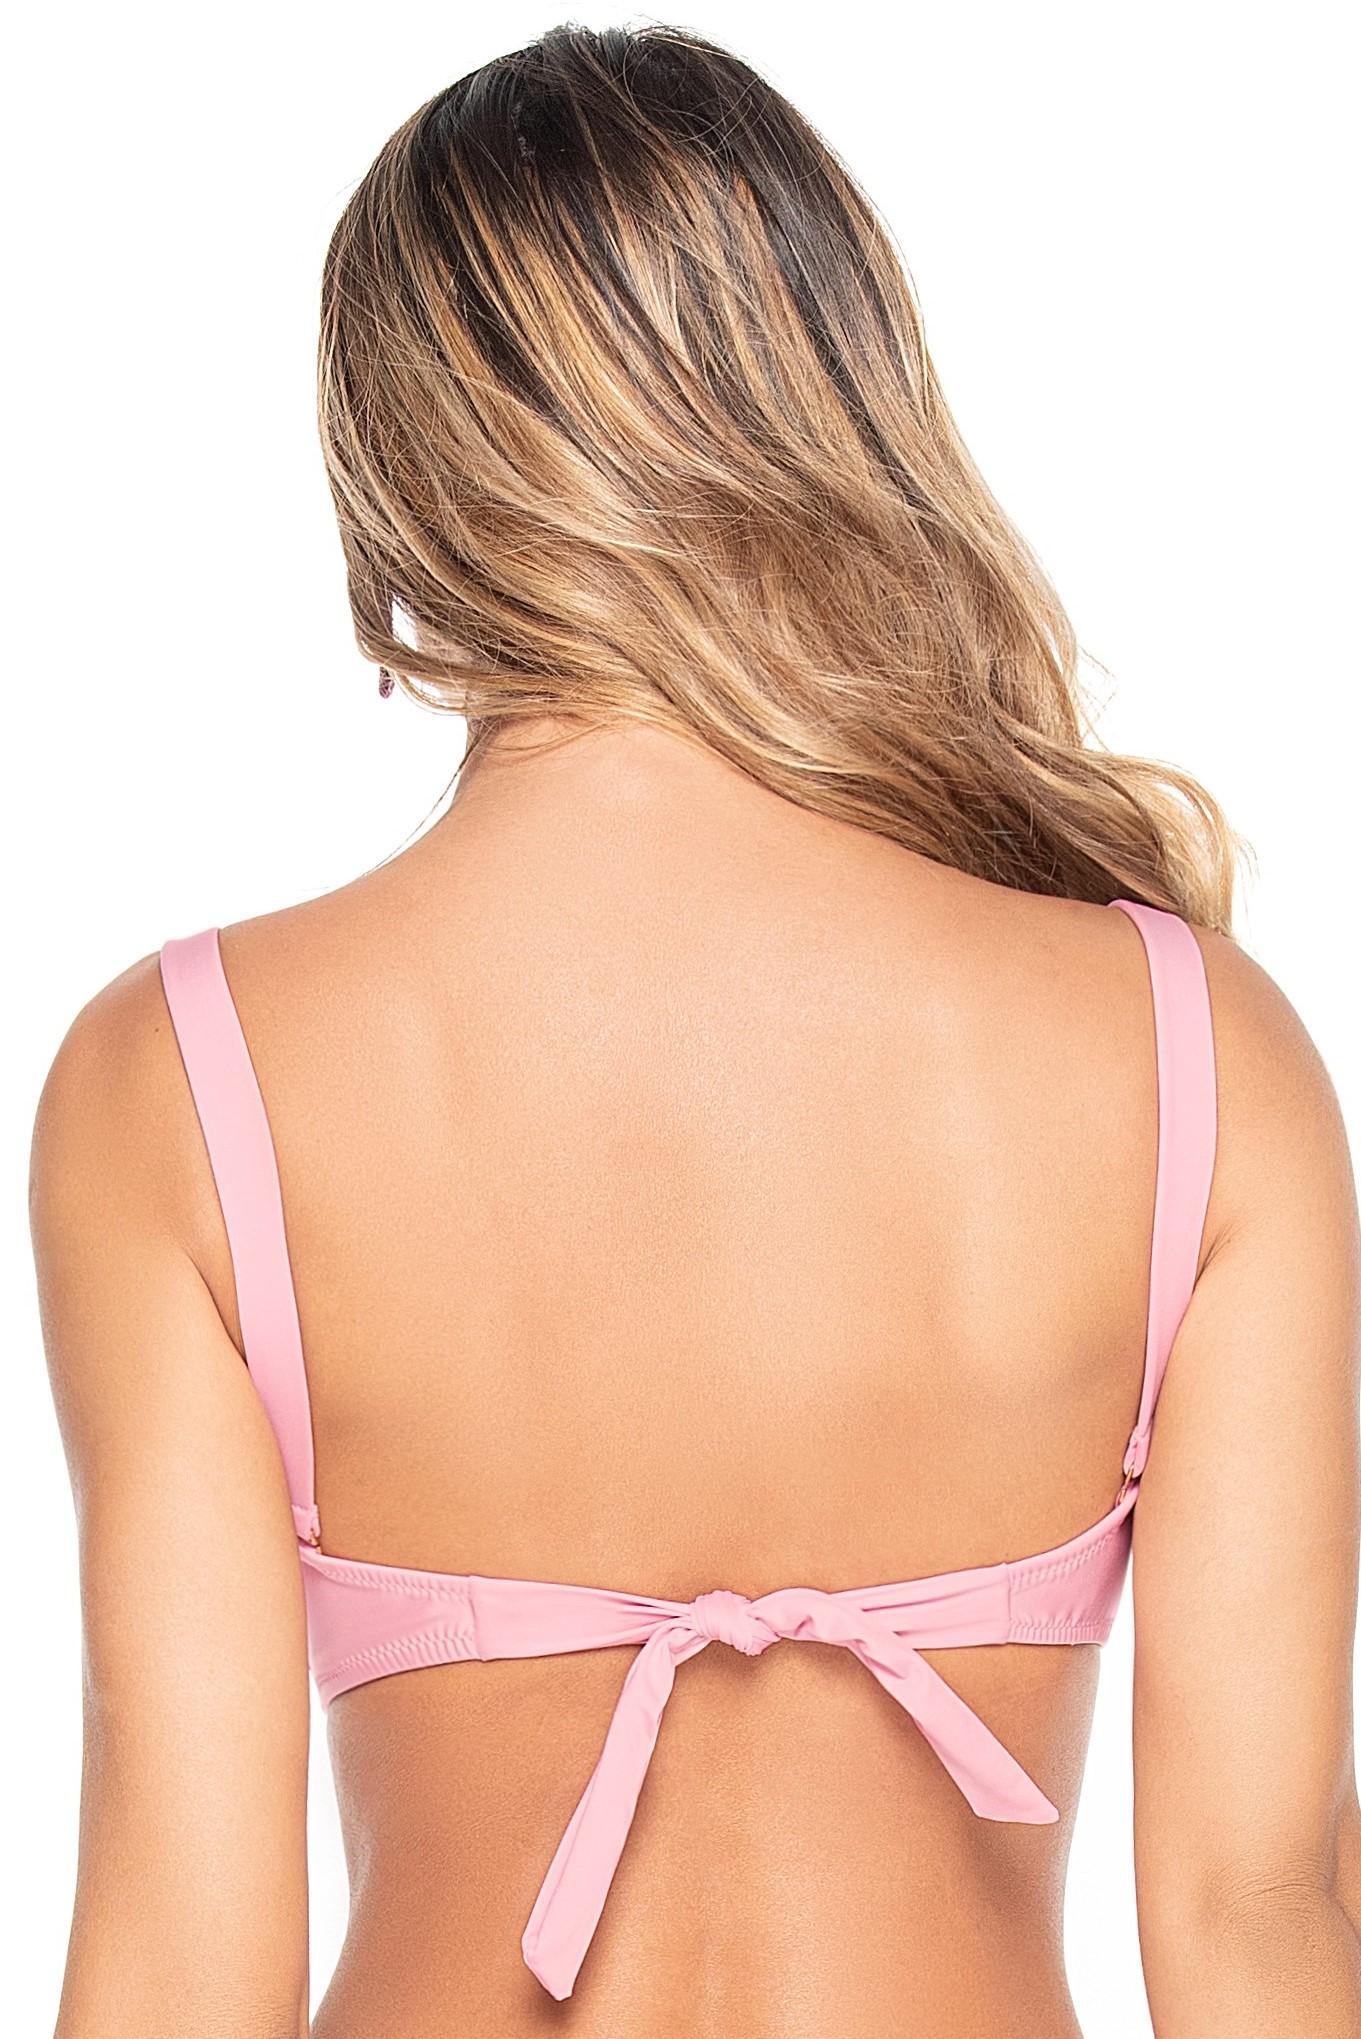 Phax Light Pink Strapless Wire Bikini Top